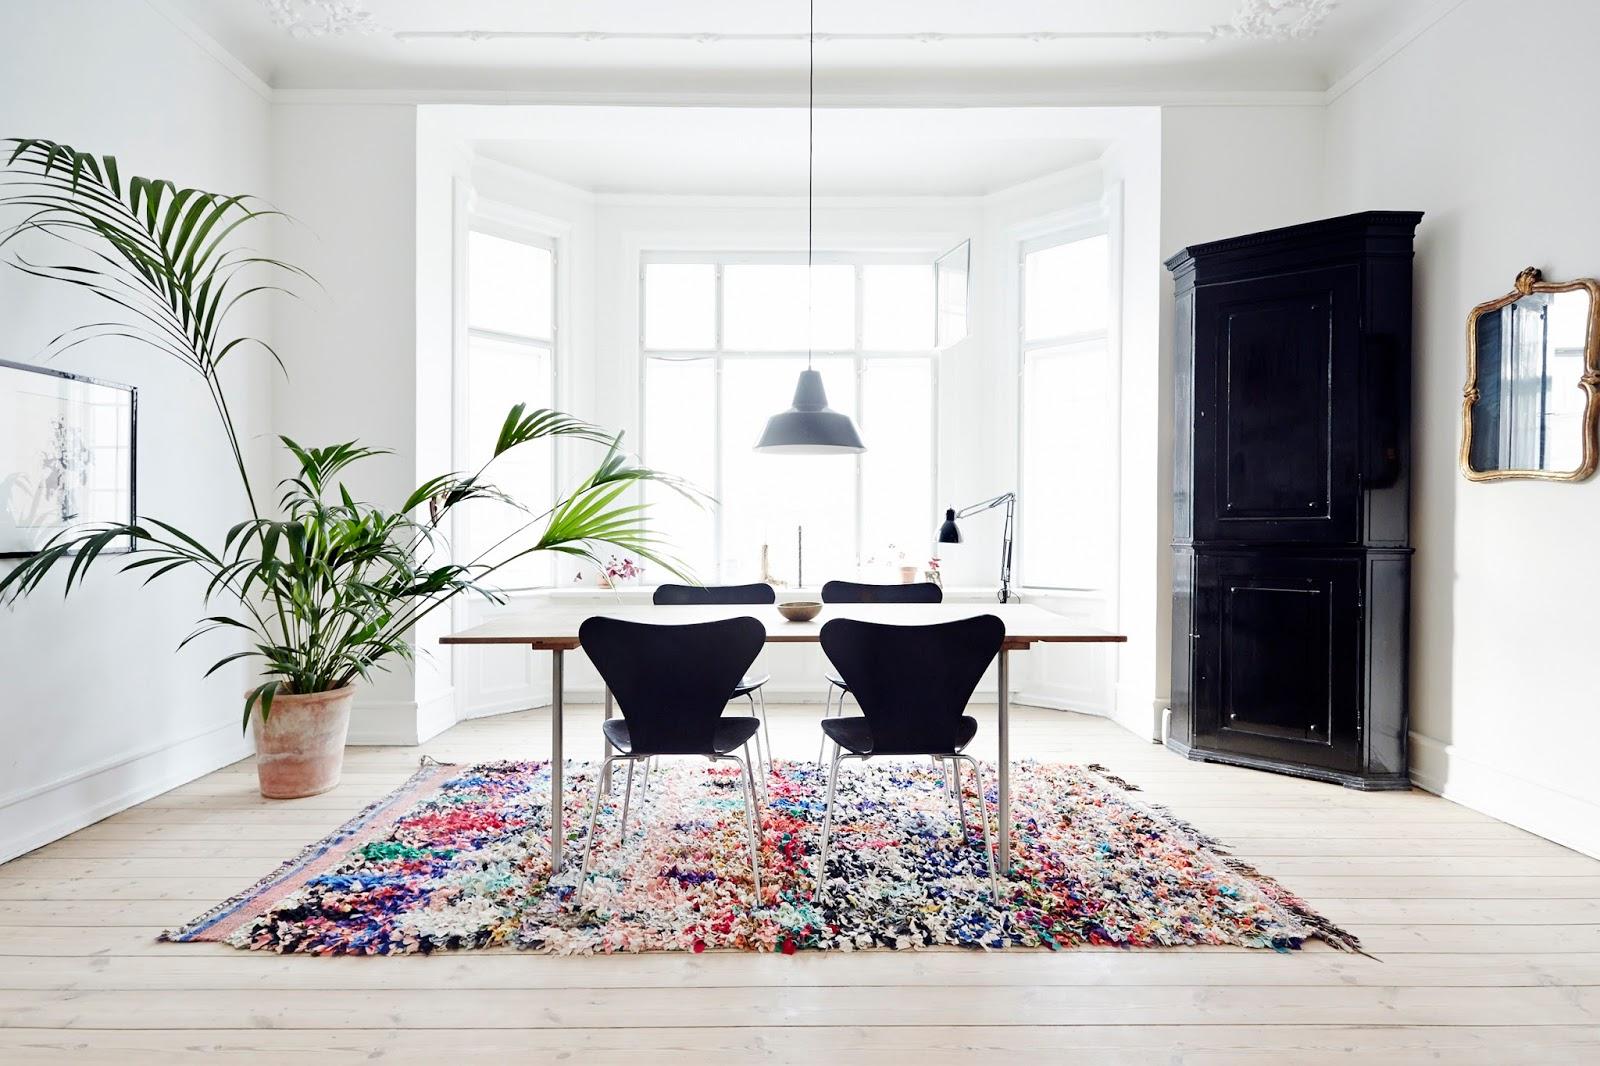 houseplant. fritz hansen chair, oriental rug, danish modern, dining table